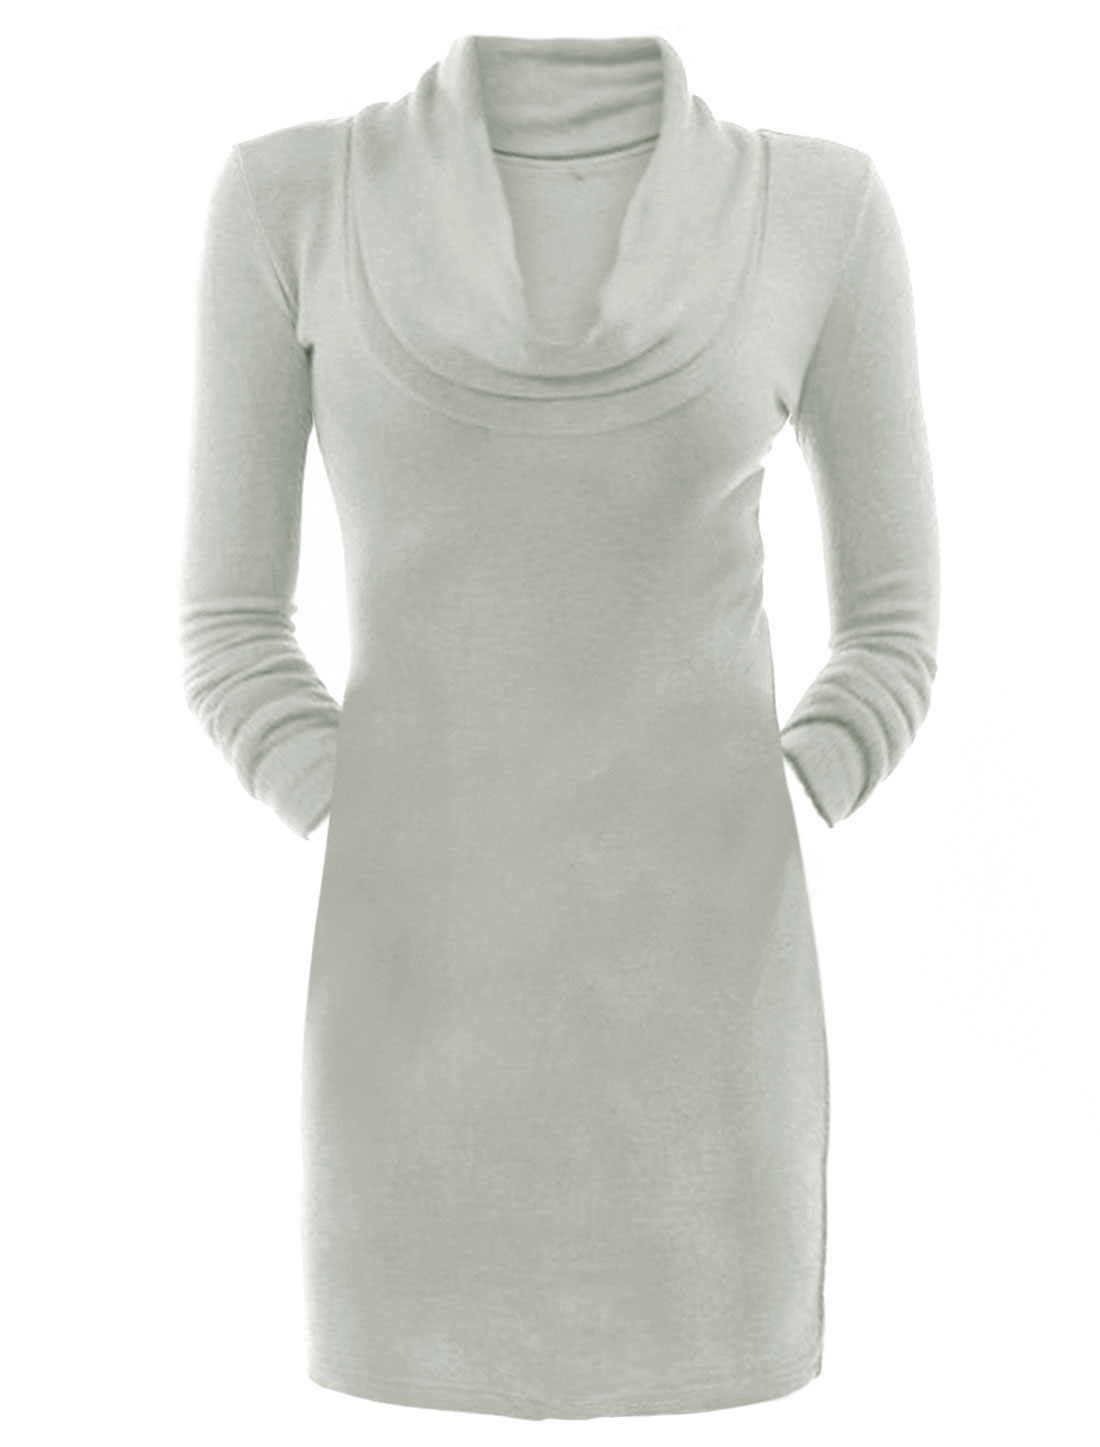 Ladies Cowl Neck Design Long Sleeves Wiggle Dress Gray XL